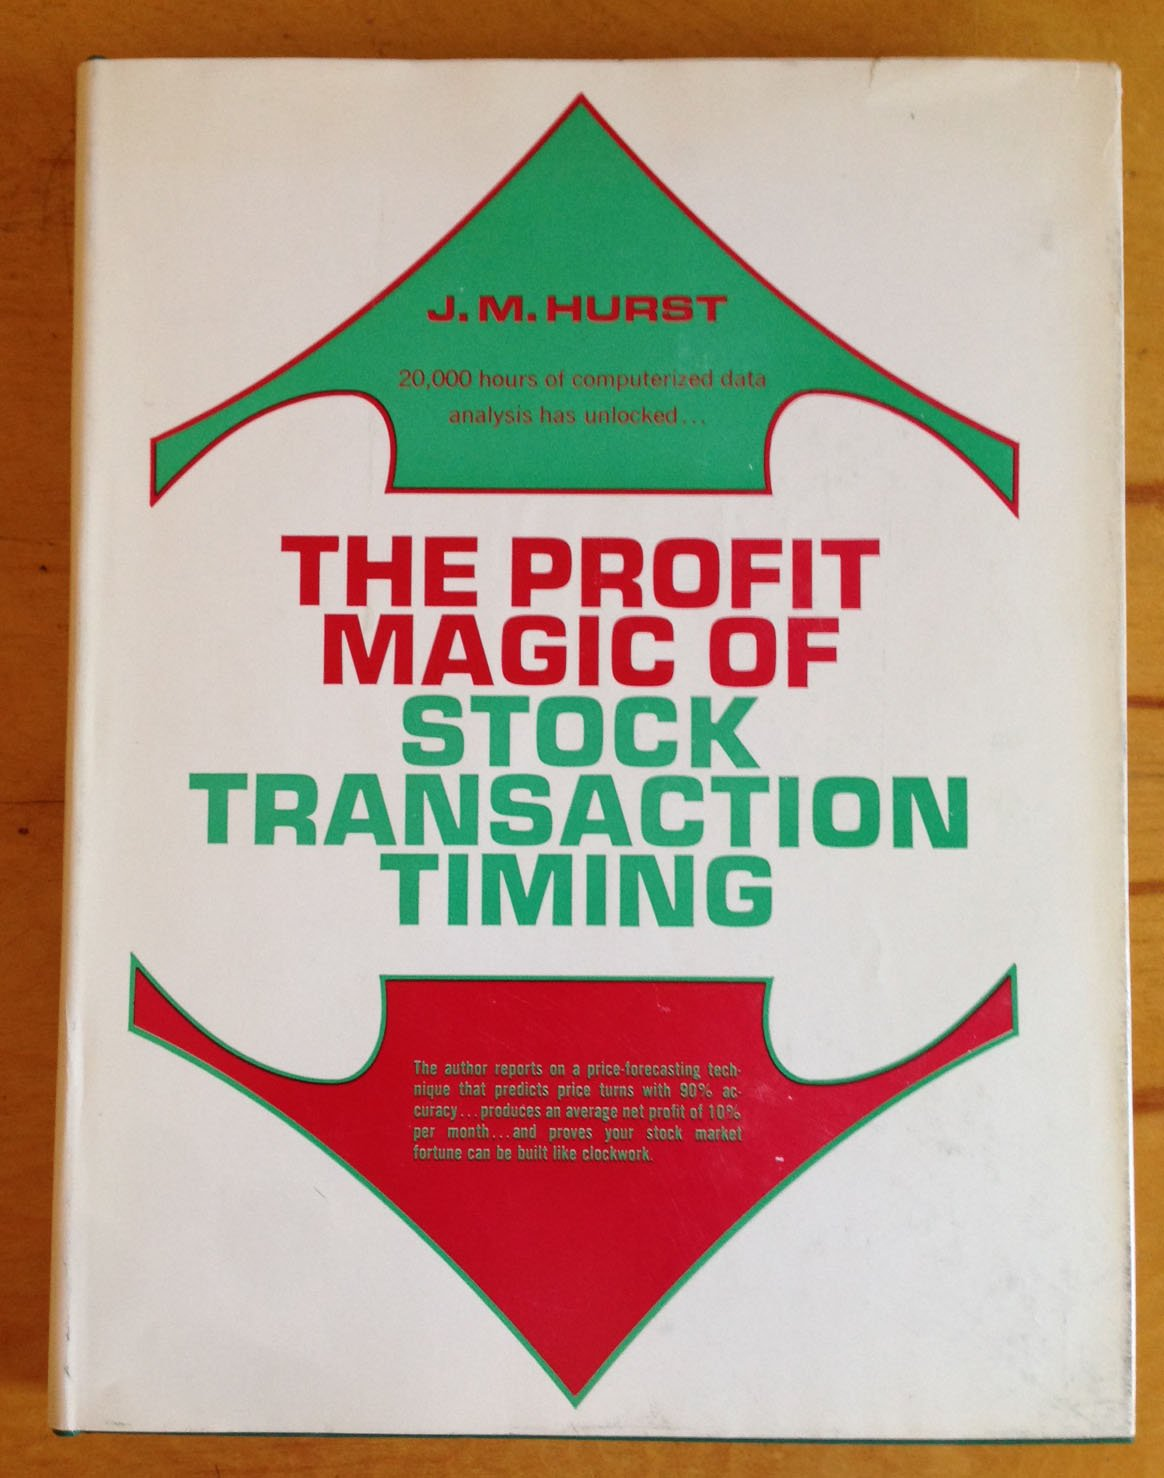 The profit magic of stock transaction timing